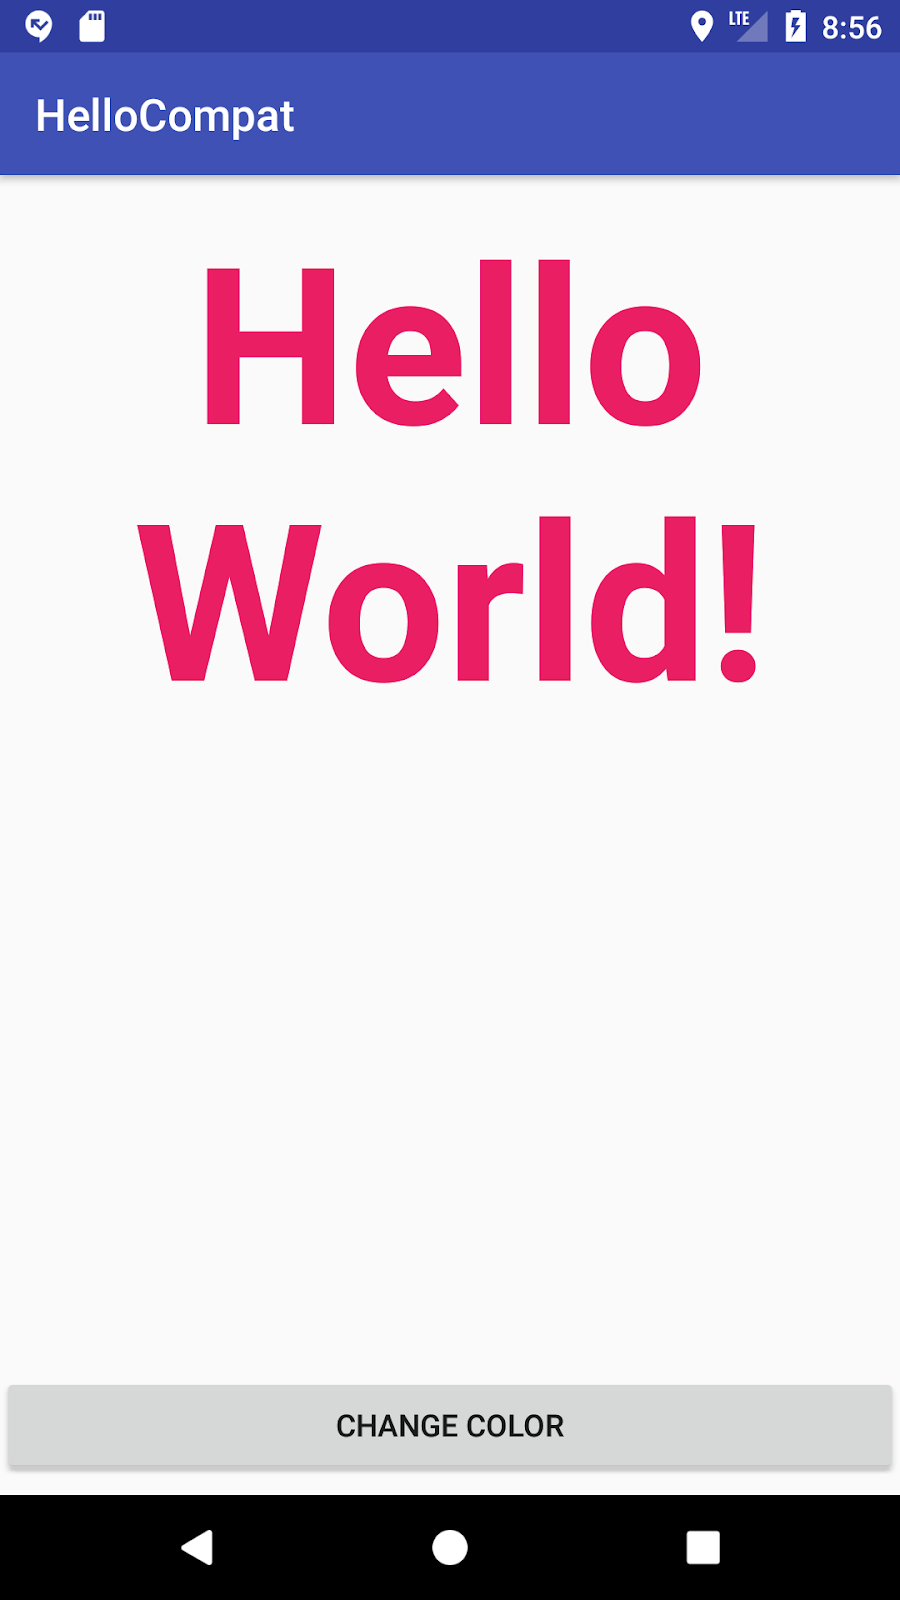 HelloCompat app